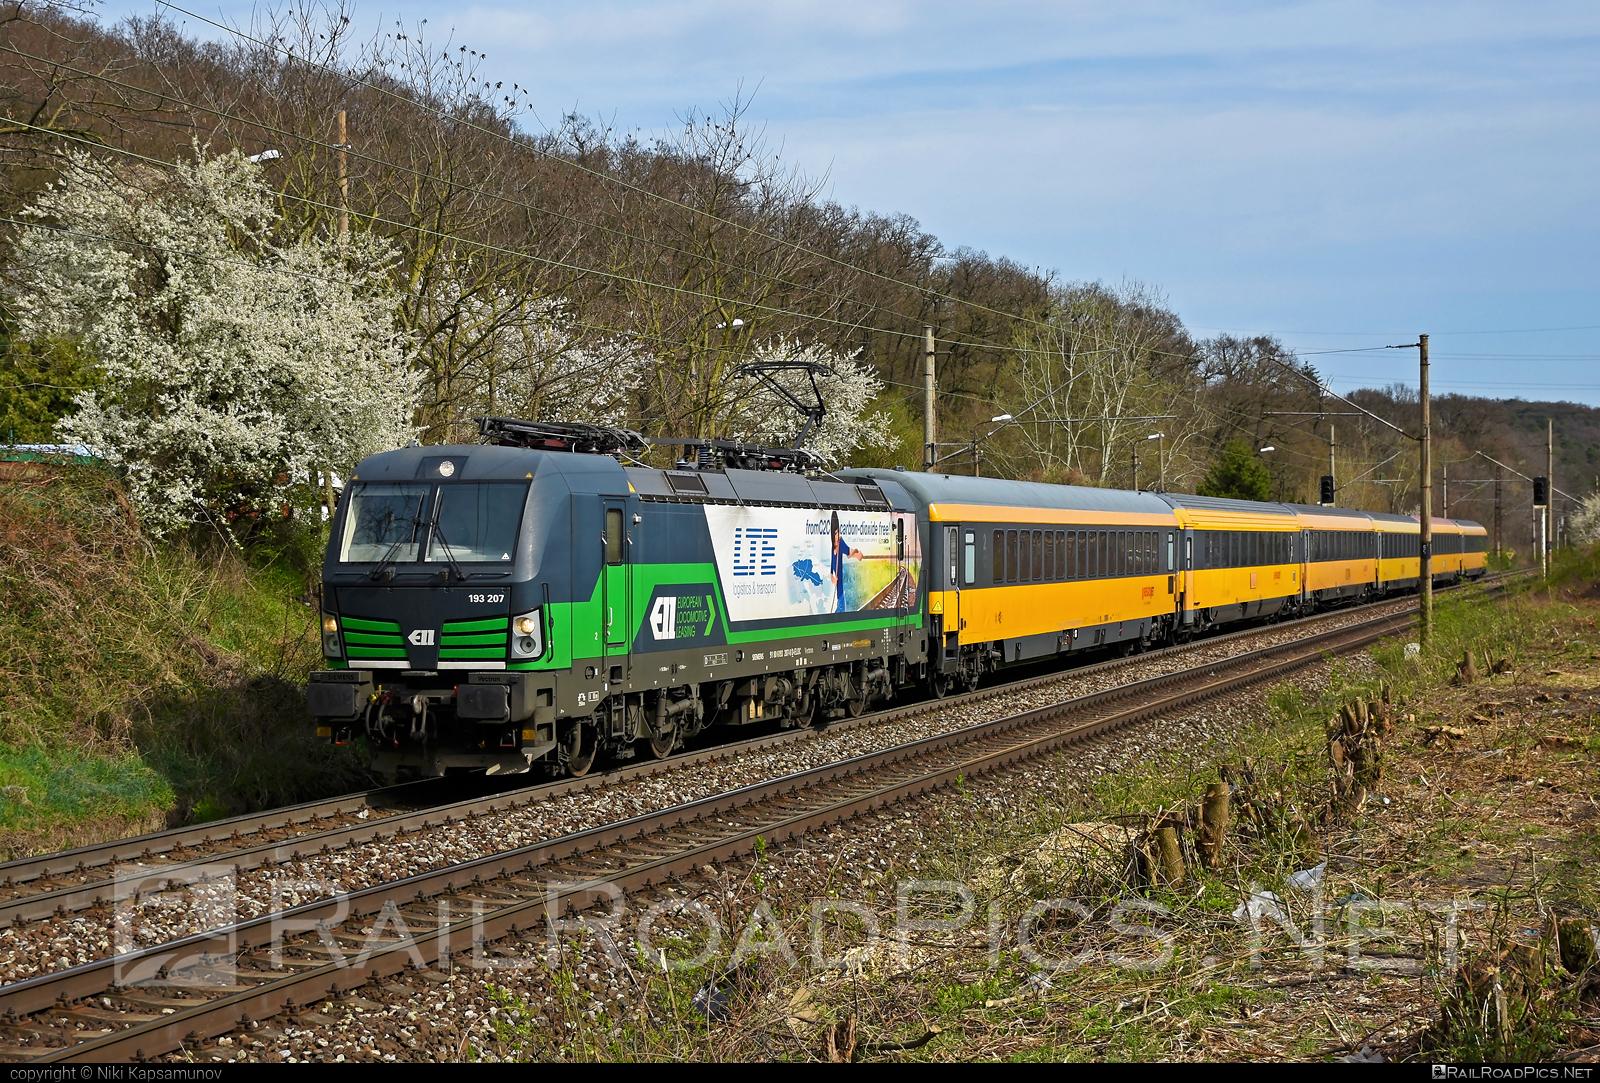 Siemens Vectron MS - 193 207 operated by RegioJet, a.s. #ell #ellgermany #eloc #europeanlocomotiveleasing #lte #regiojet #siemens #siemensvectron #siemensvectronms #vectron #vectronms